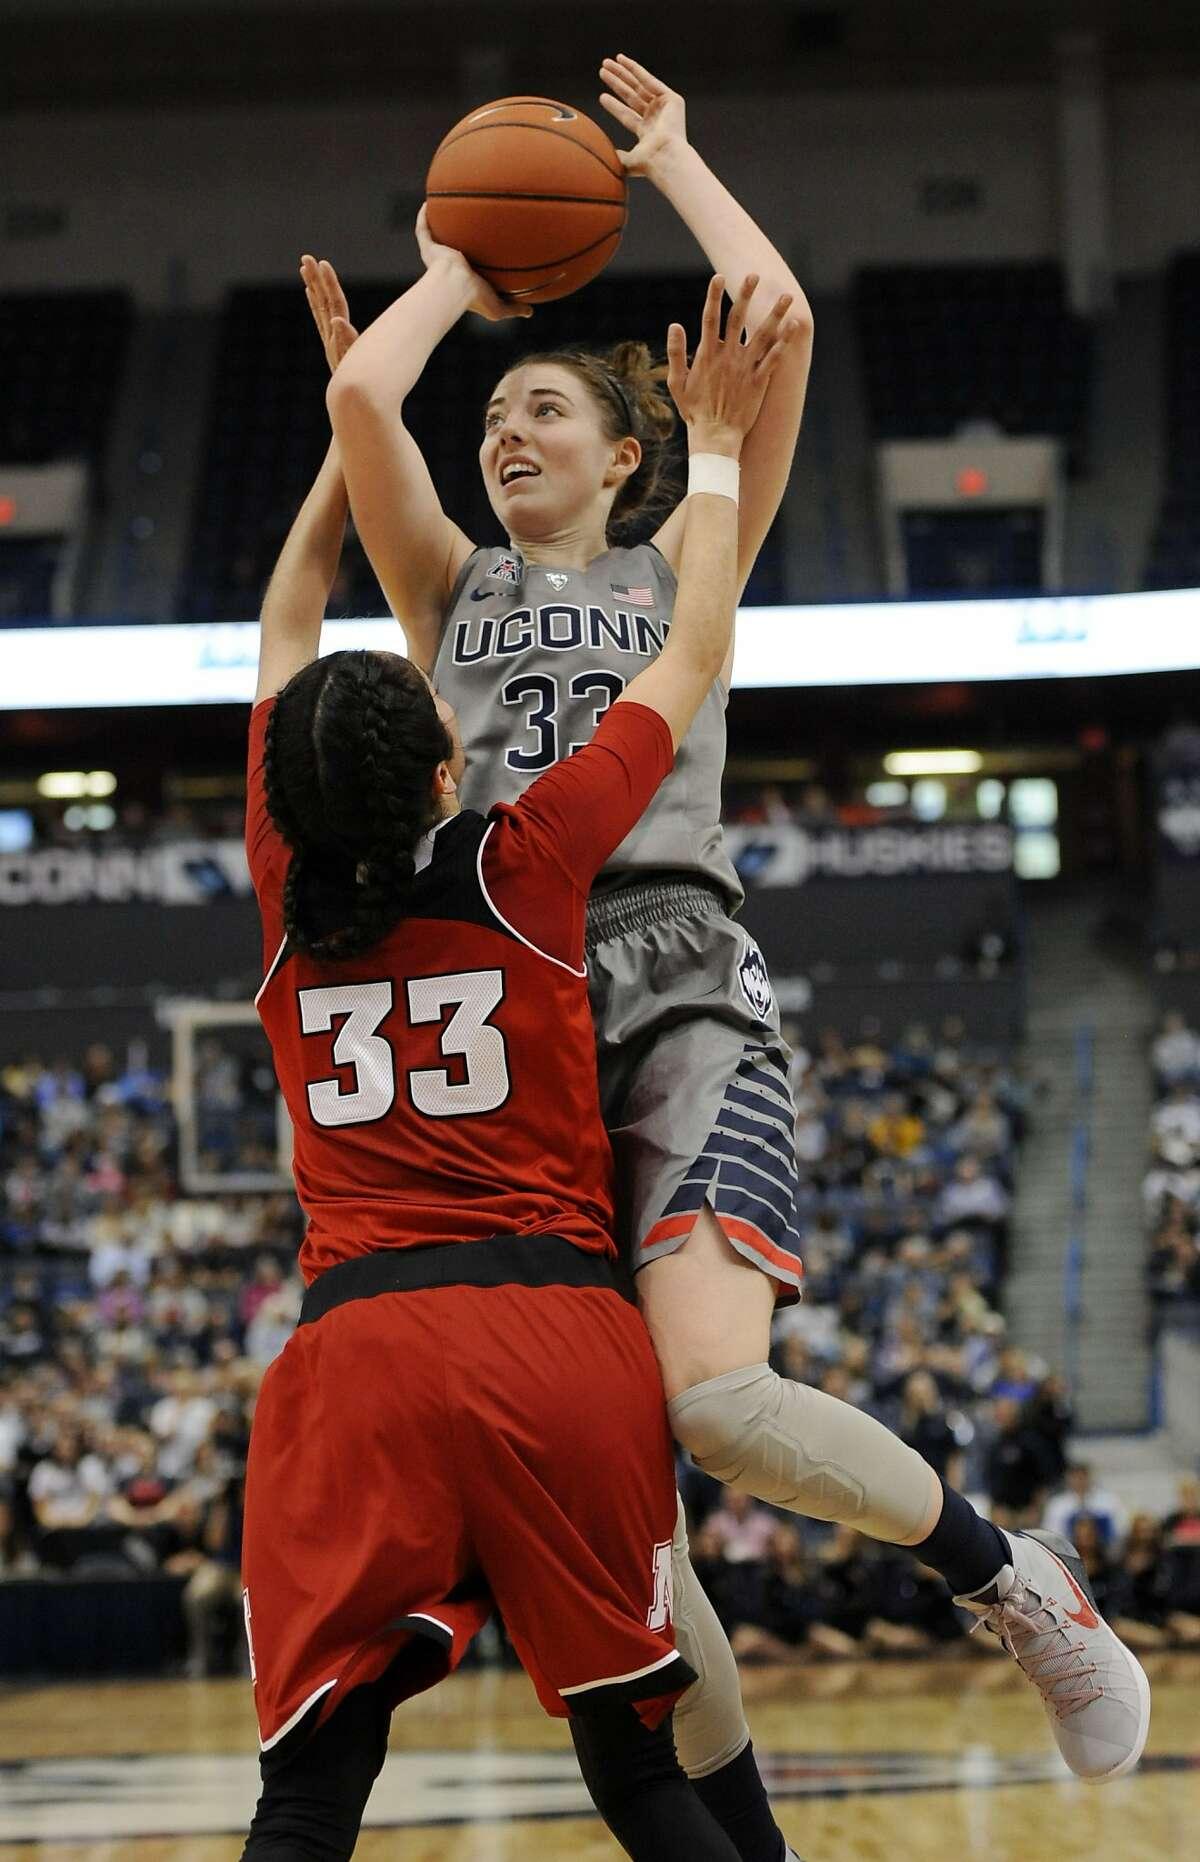 UConn vs. Nebraska - Nov. 28, 2015 W: 88-46 Led team in points: Breanna Stewart (25) Led team in rebounds: Breanna Stewart (10)